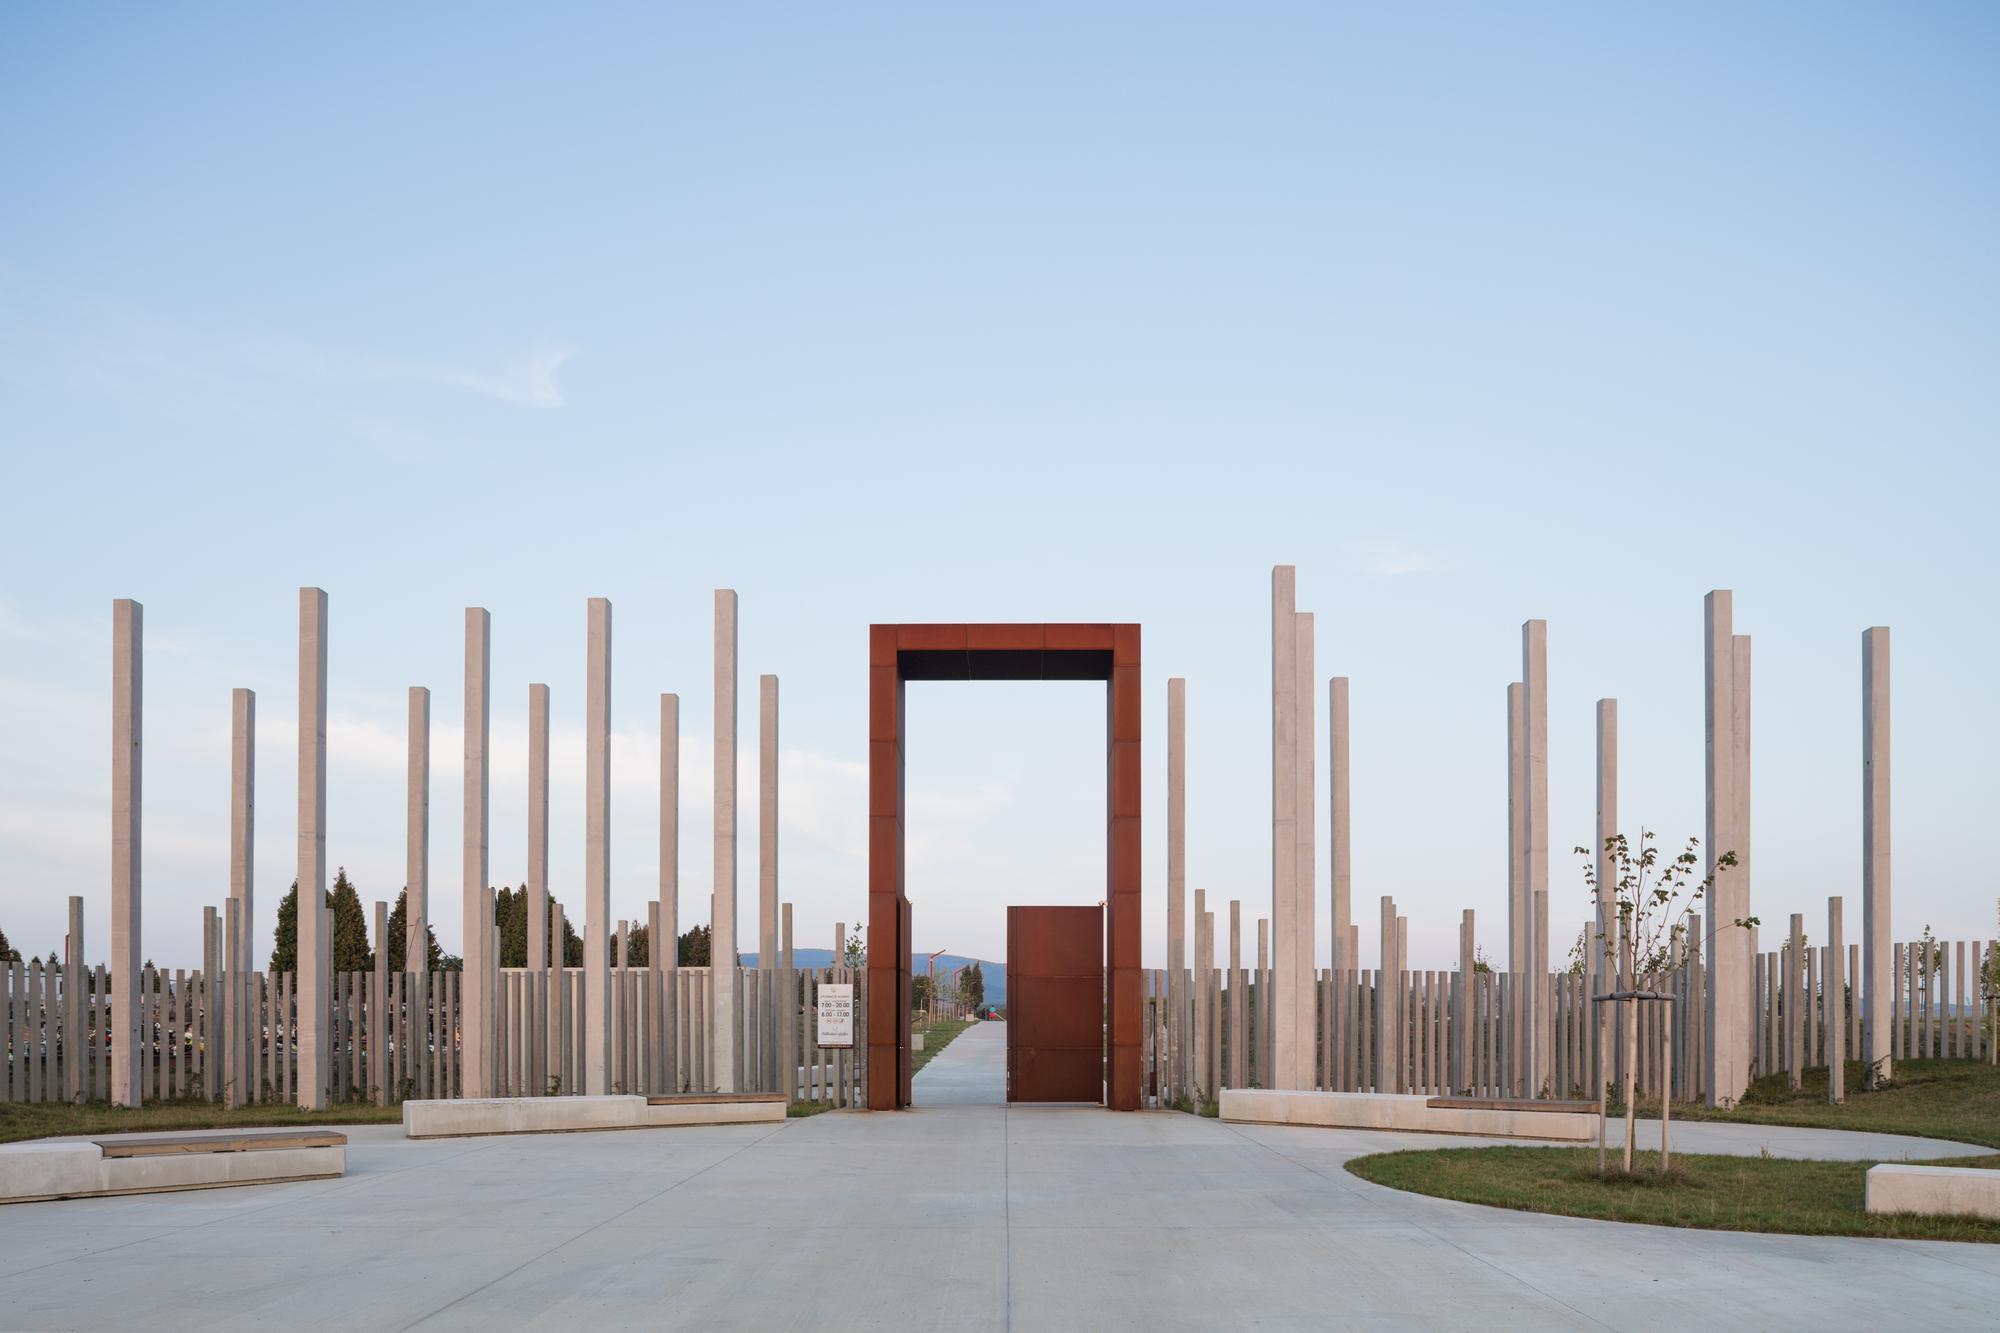 Svaby / STOA Architekti